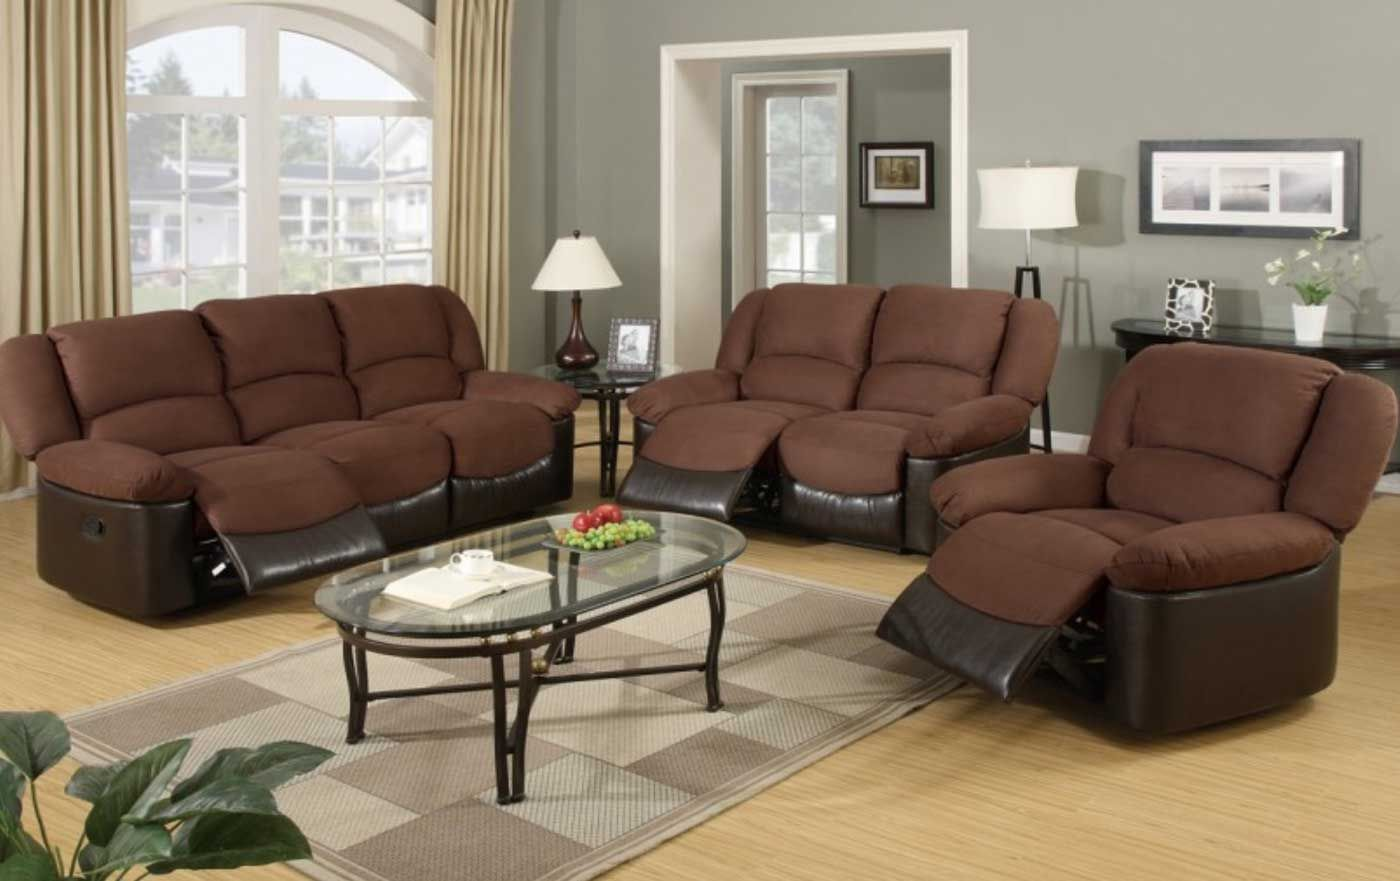 Medium Crop Of Living Room Set Up